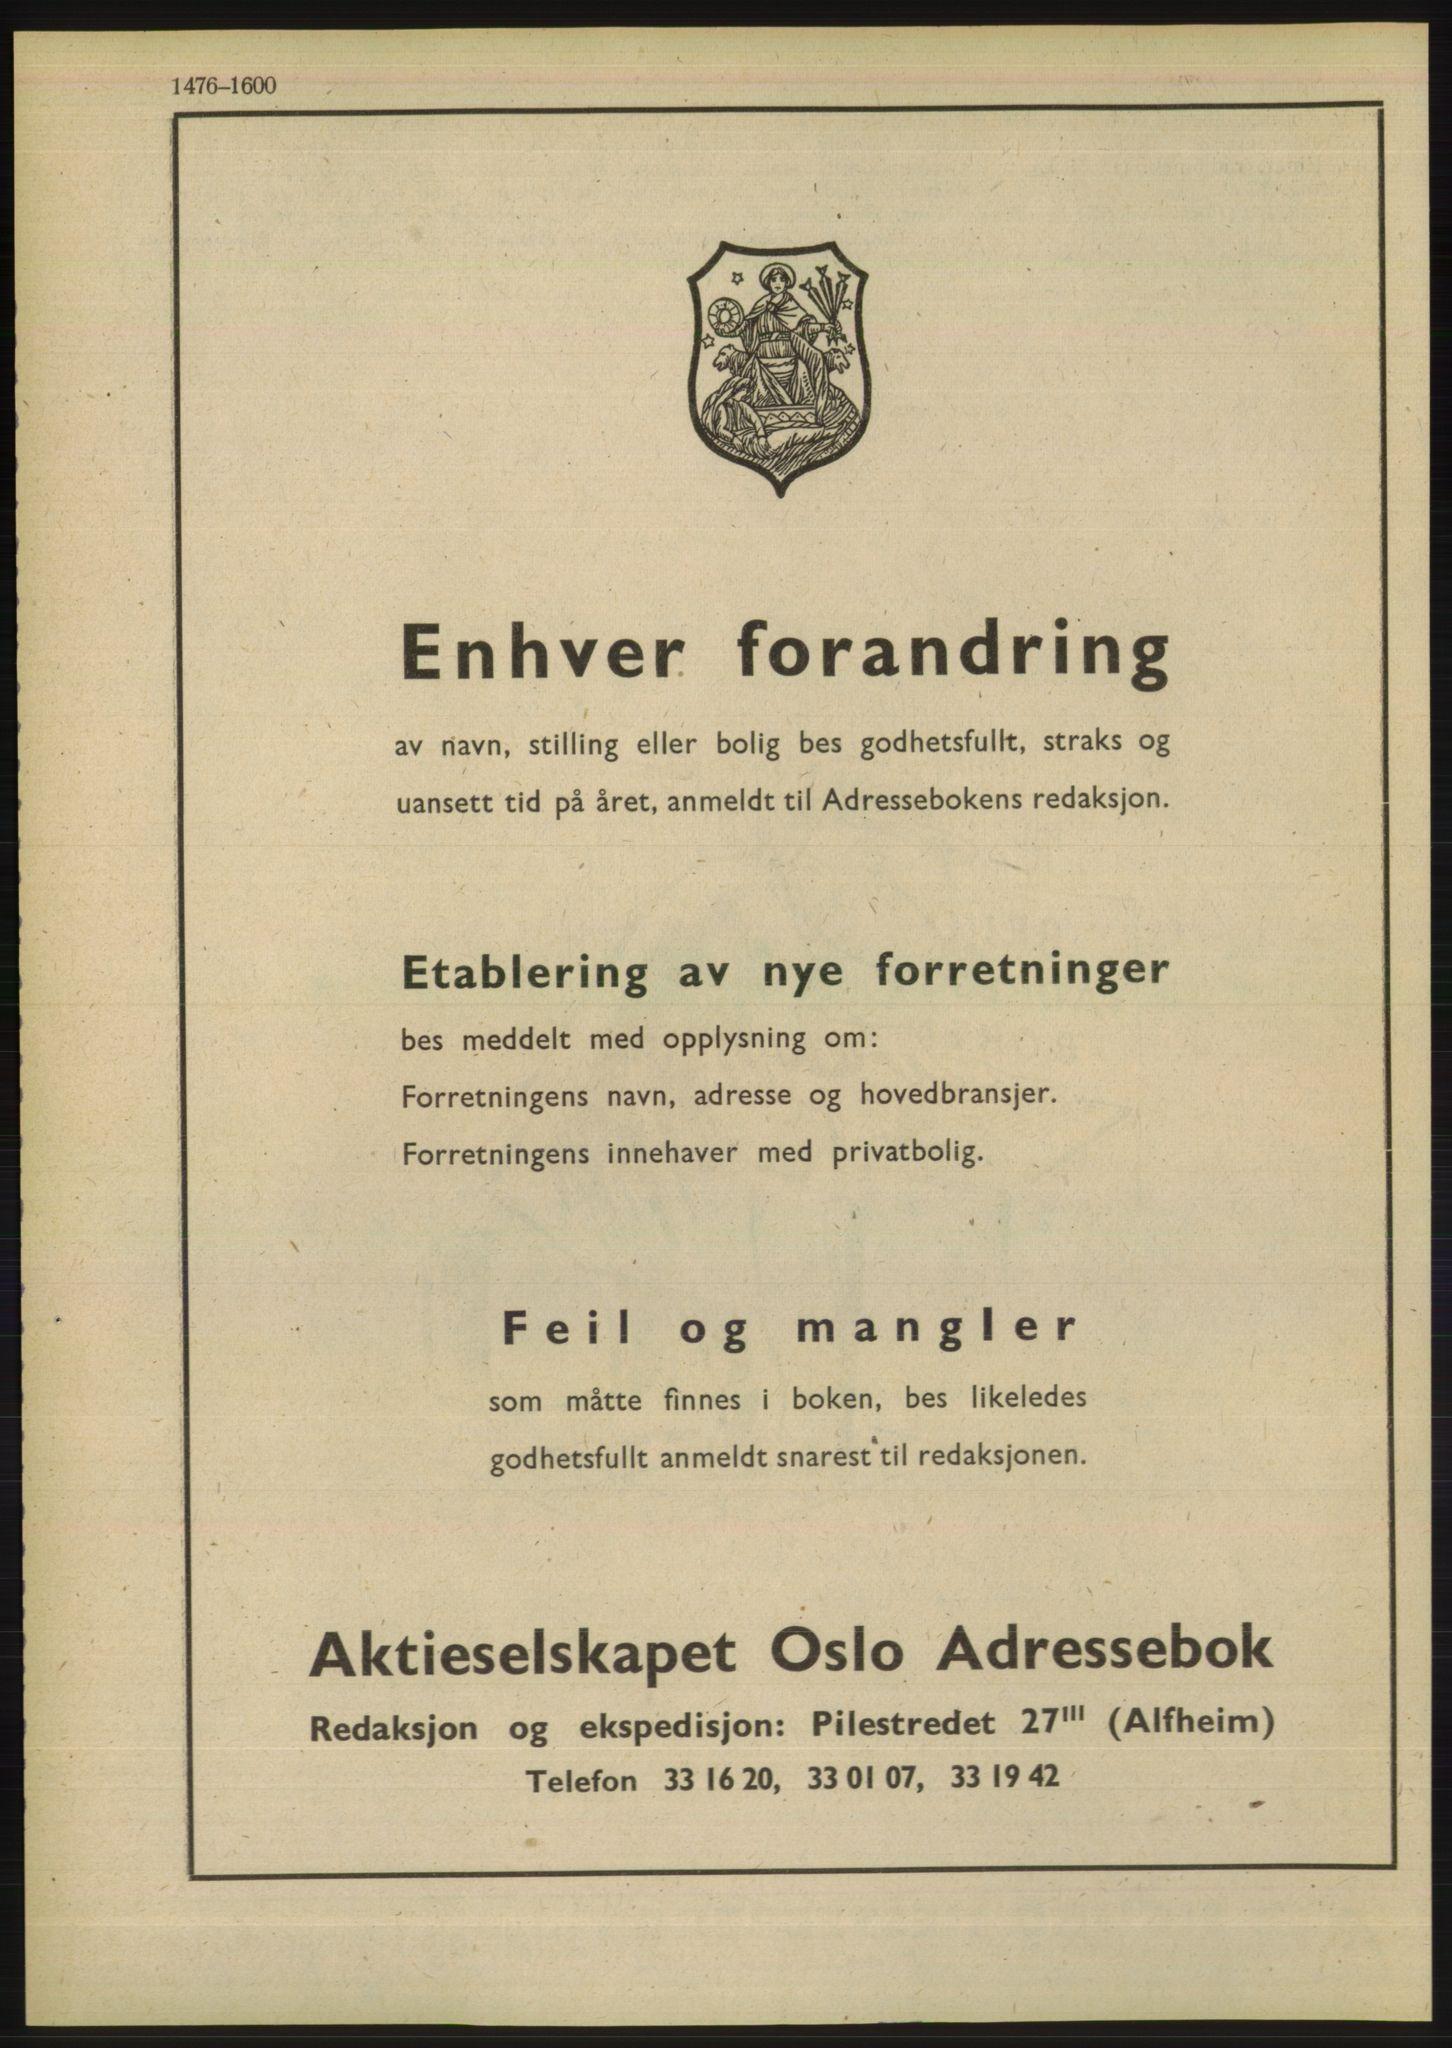 PUBL, Kristiania/Oslo adressebok, 1948, p. 1476